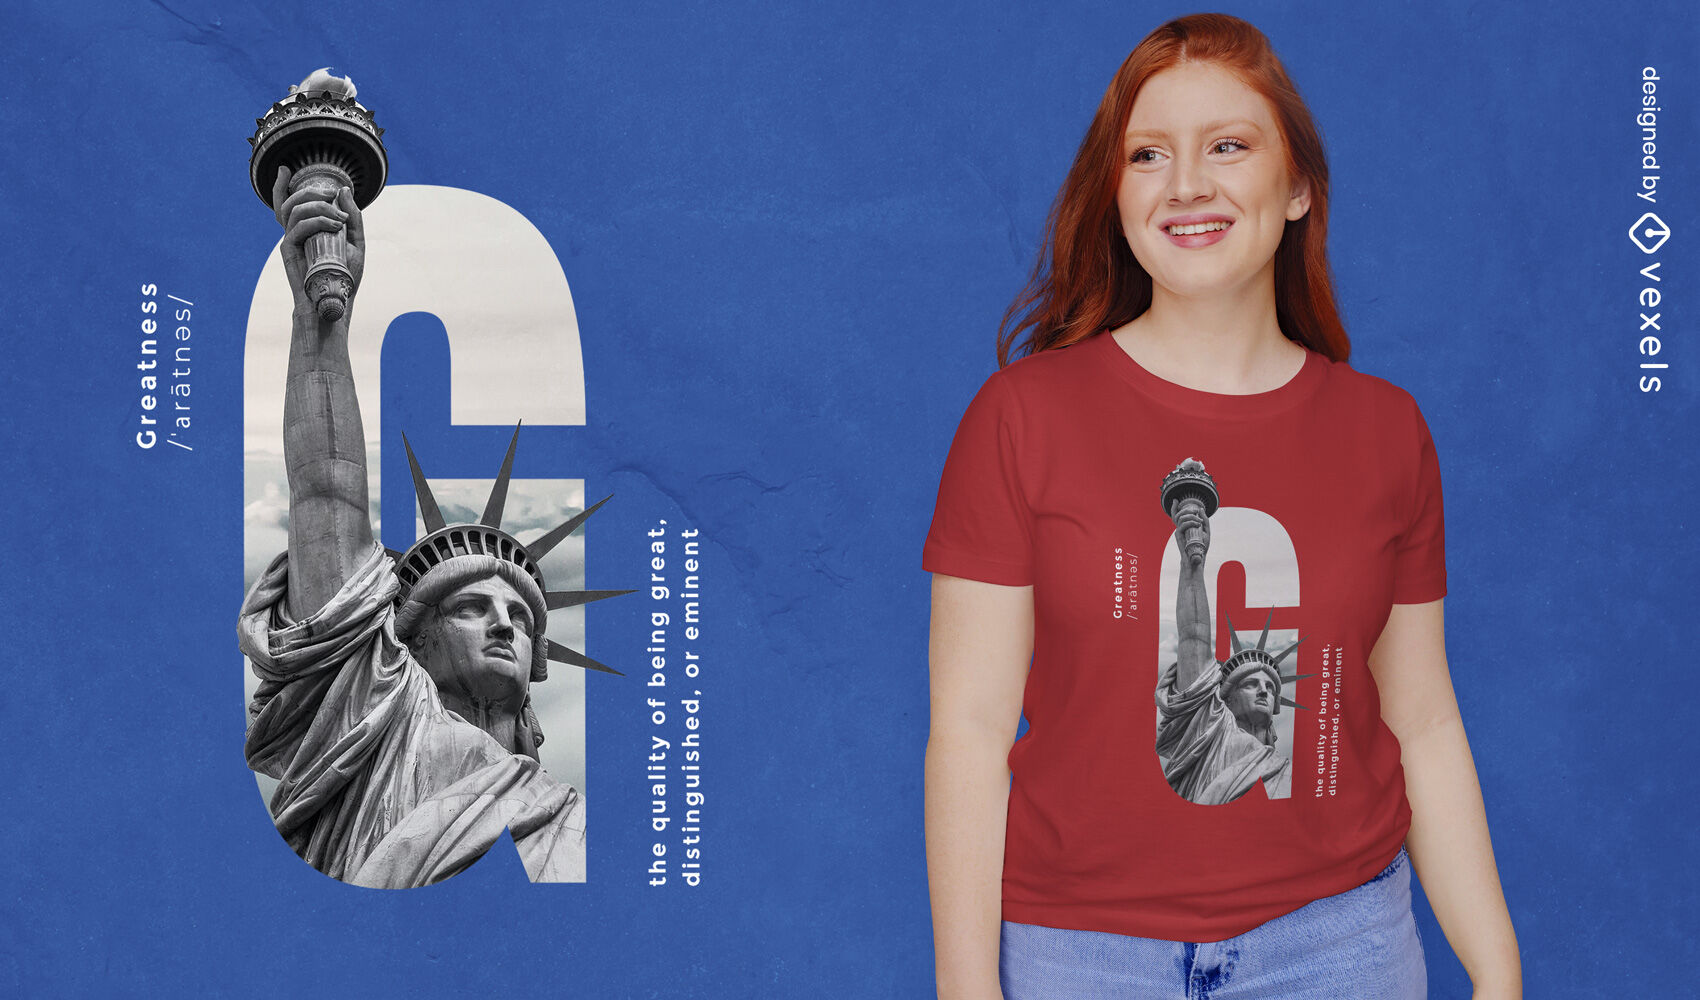 Libertad estatua grandeza psd diseño de camiseta